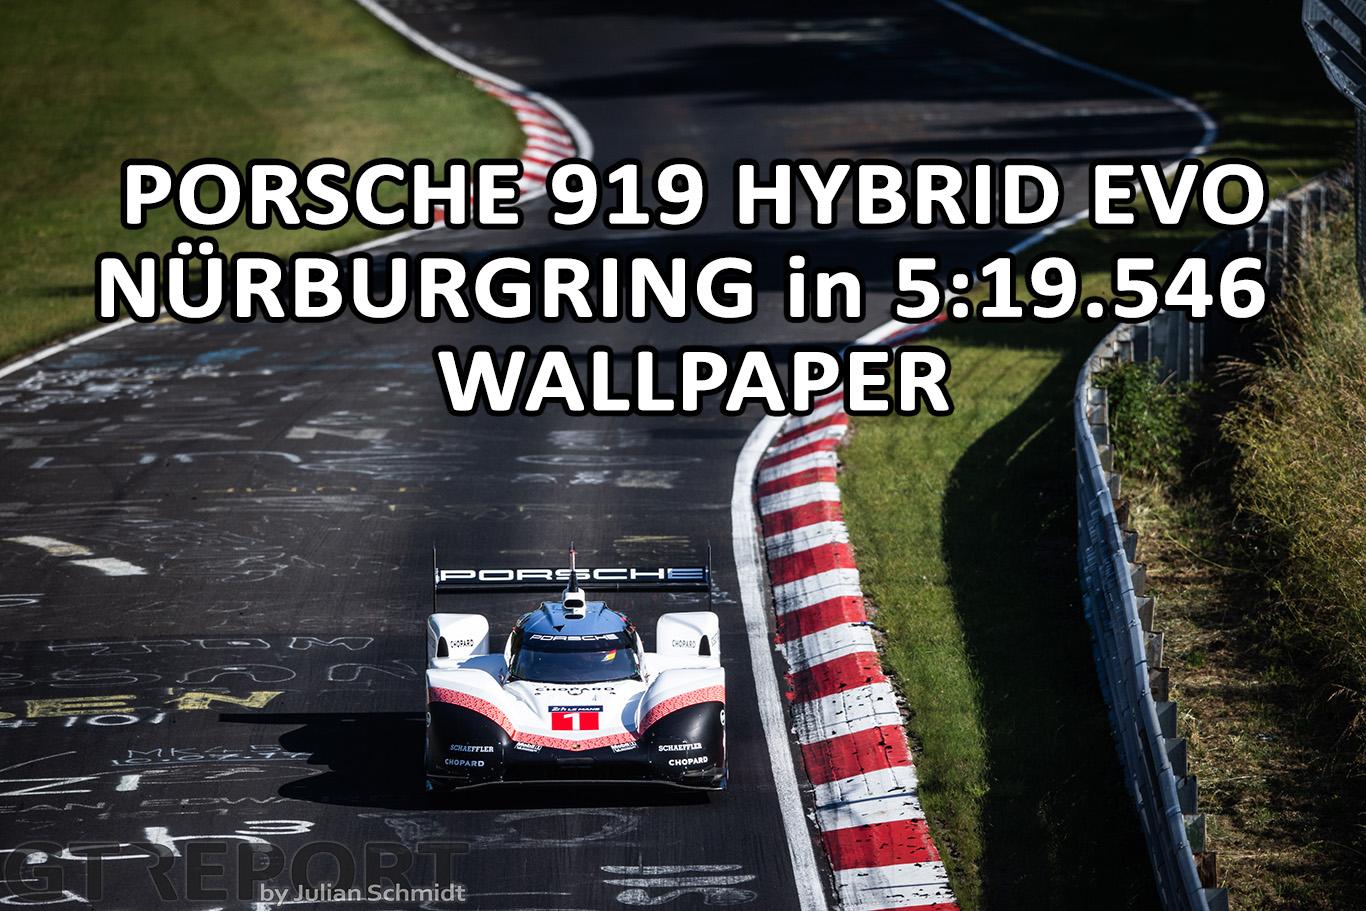 Porsche 919 Hybrid Evo wallpaper